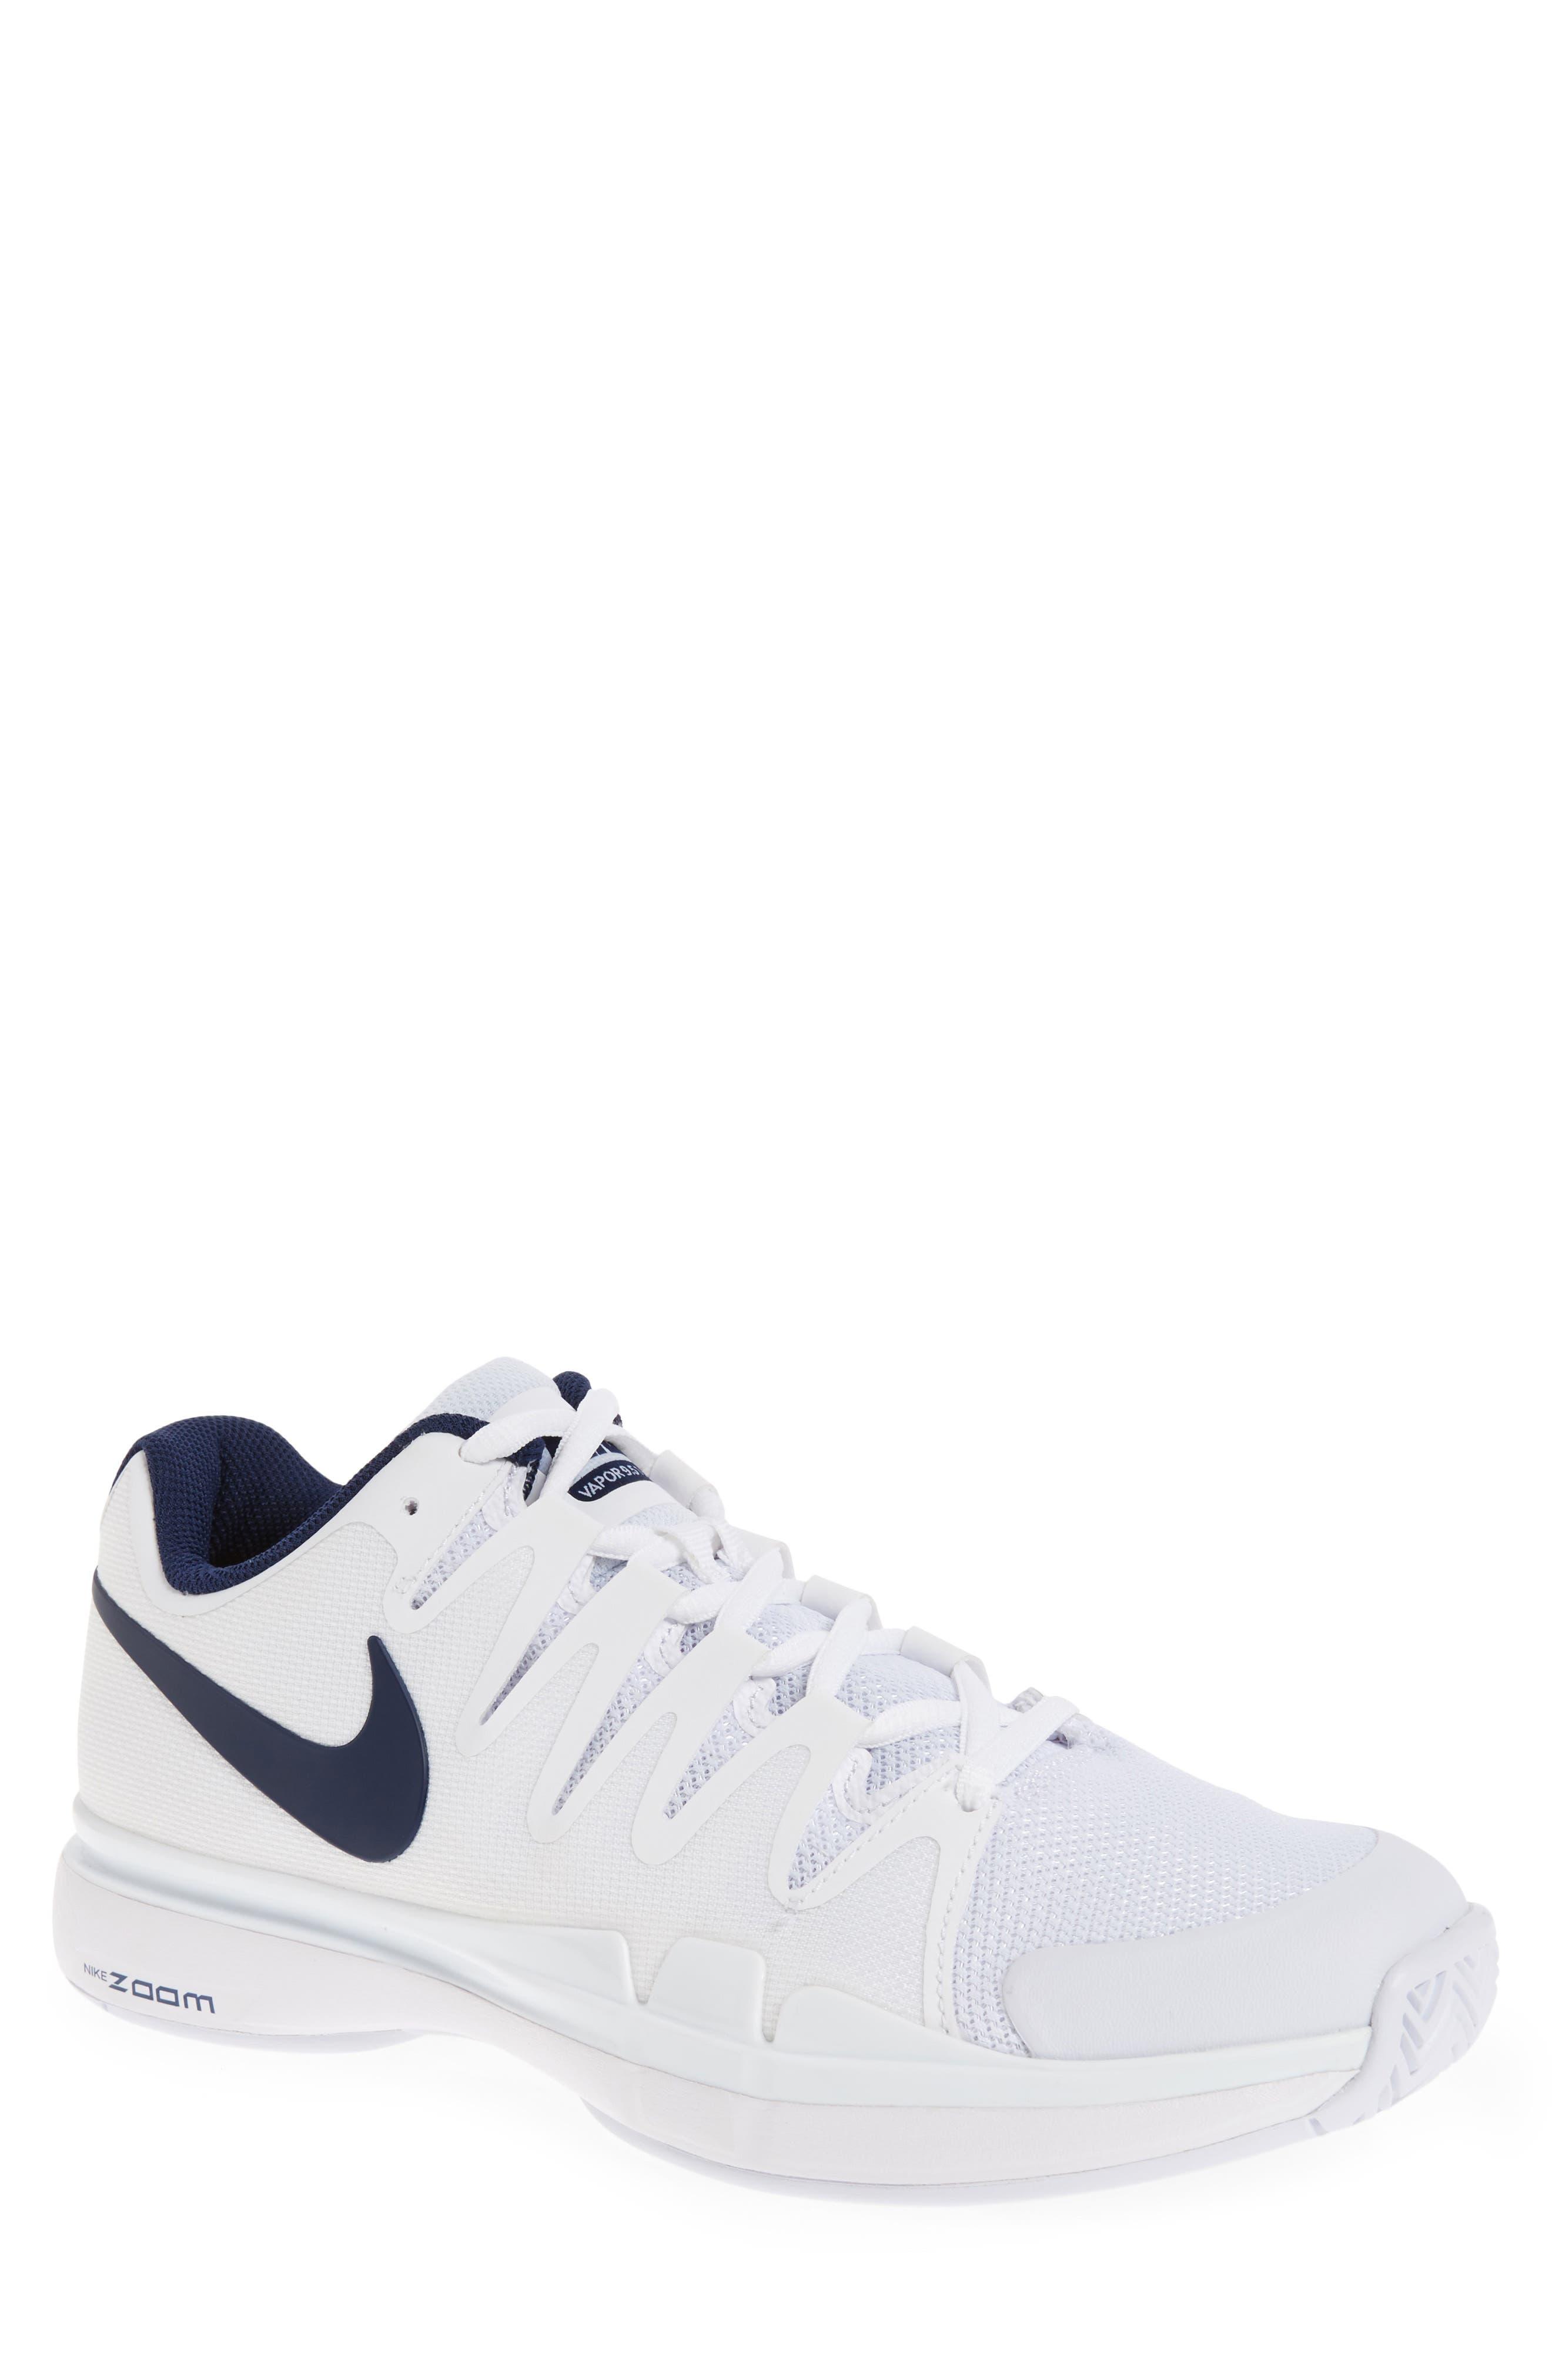 Nike \u0027Zoom Vapor 9.5 Tour\u0027 Tennis Shoe (Men)